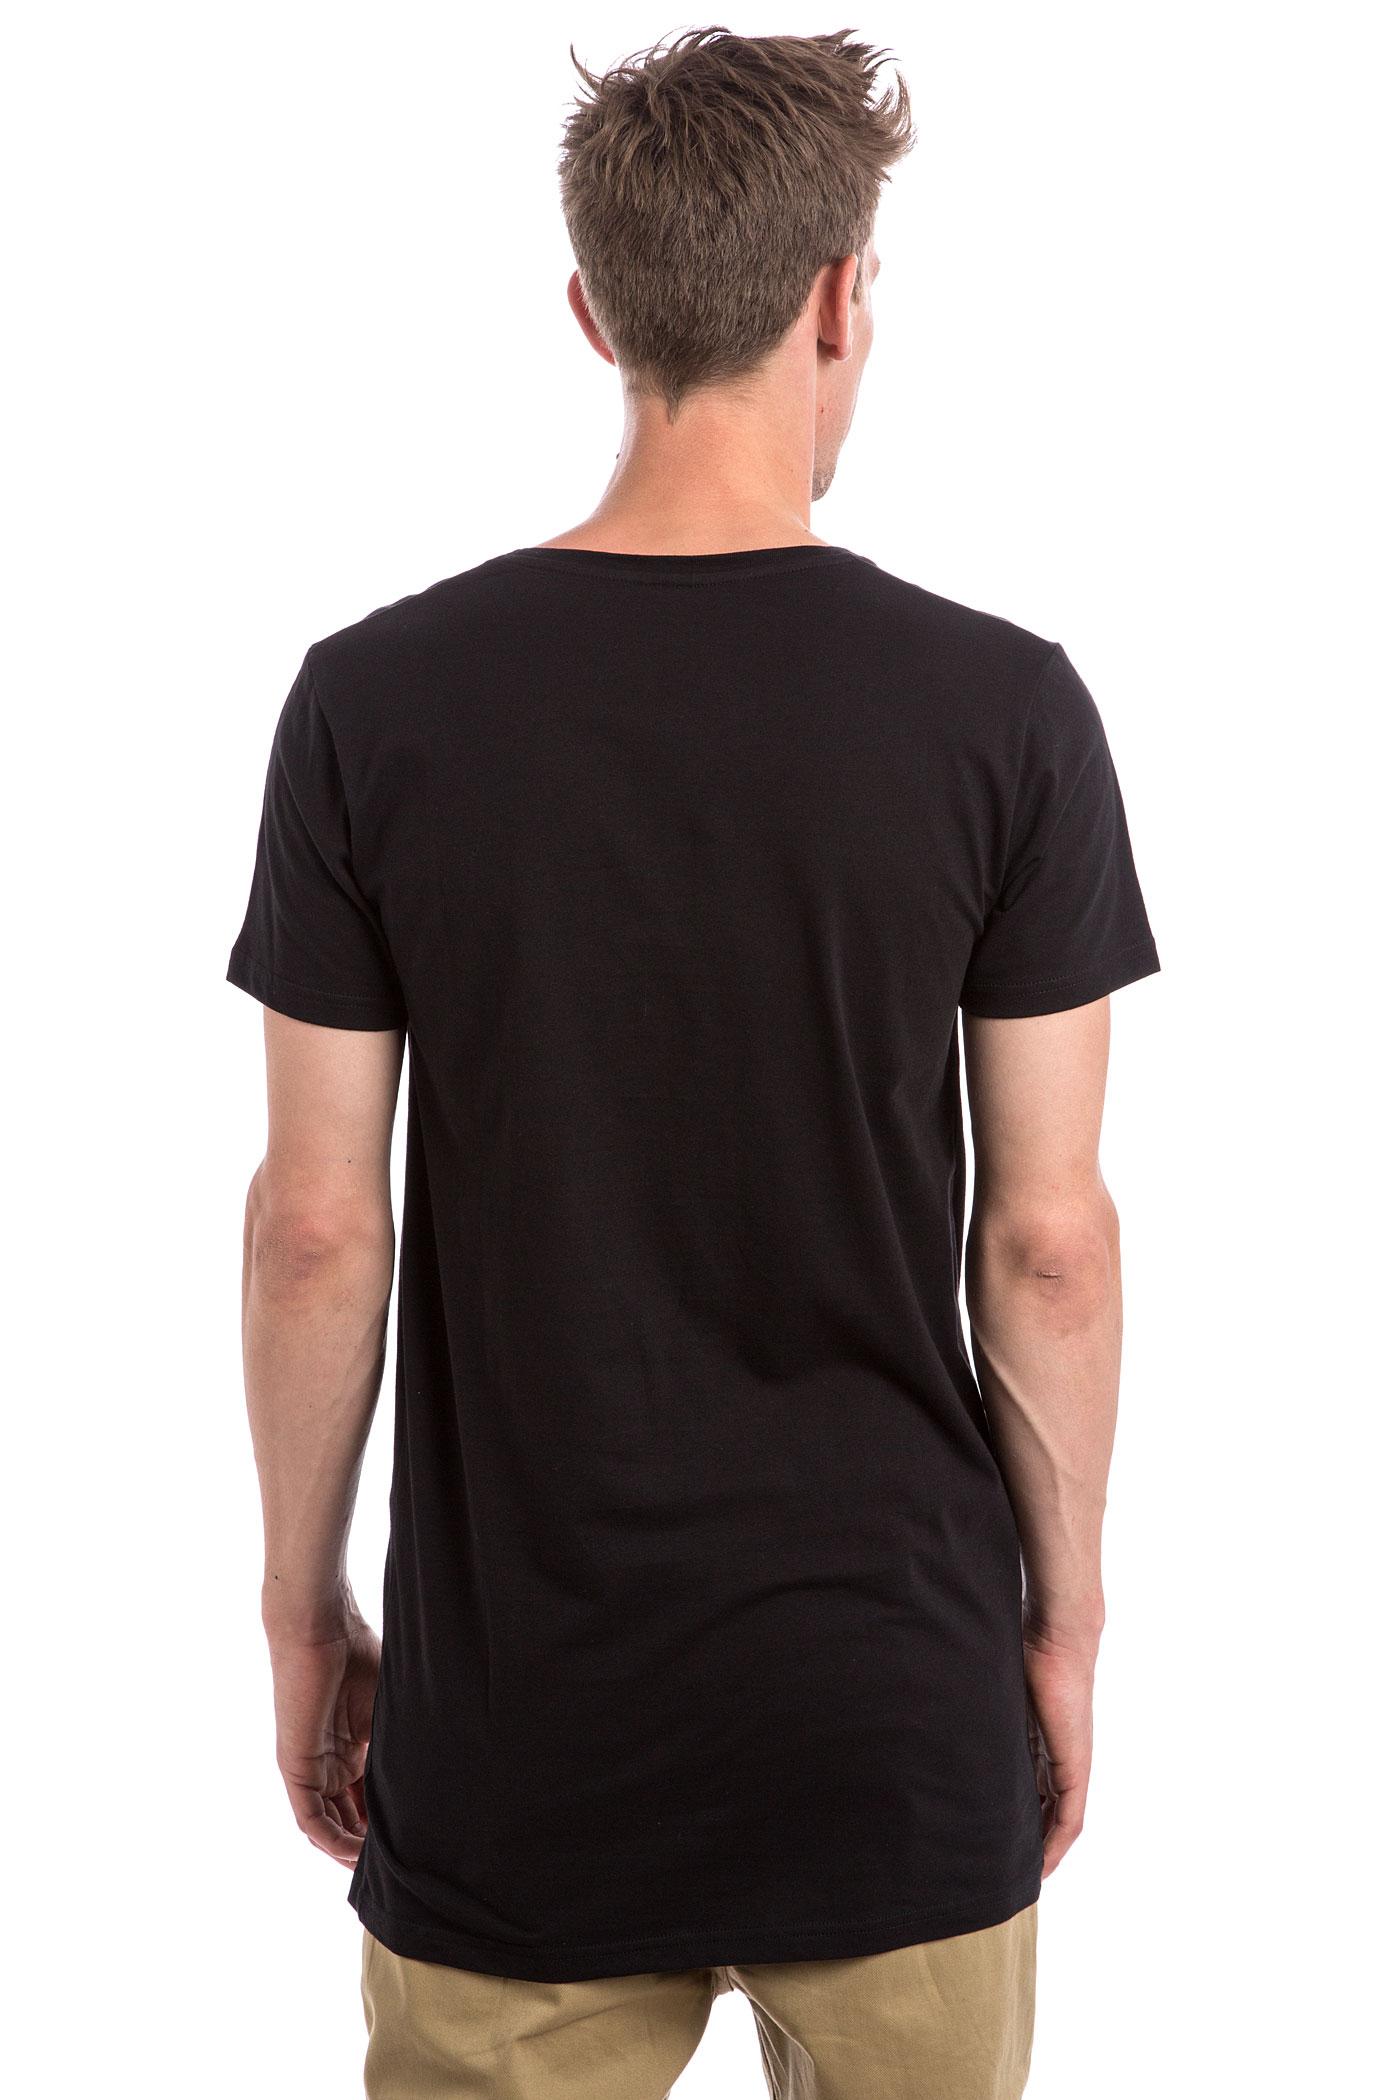 iriedaily long subneck t shirt black kaufen bei skatedeluxe. Black Bedroom Furniture Sets. Home Design Ideas